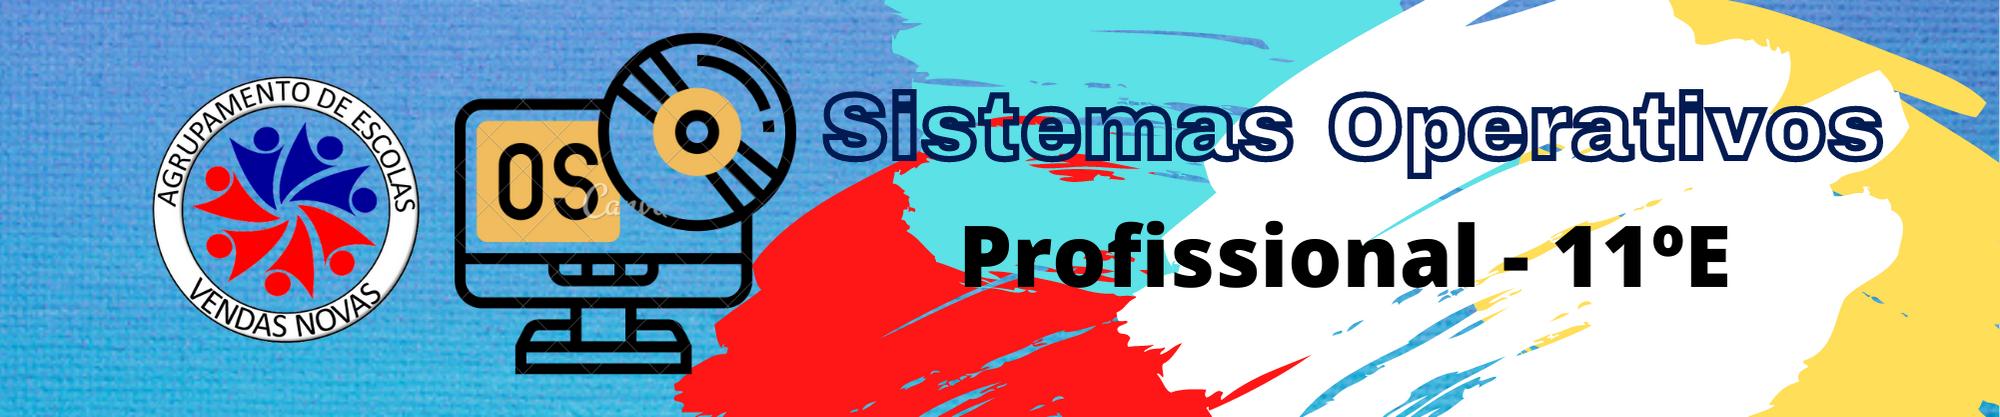 11E - Sistemas Operativos